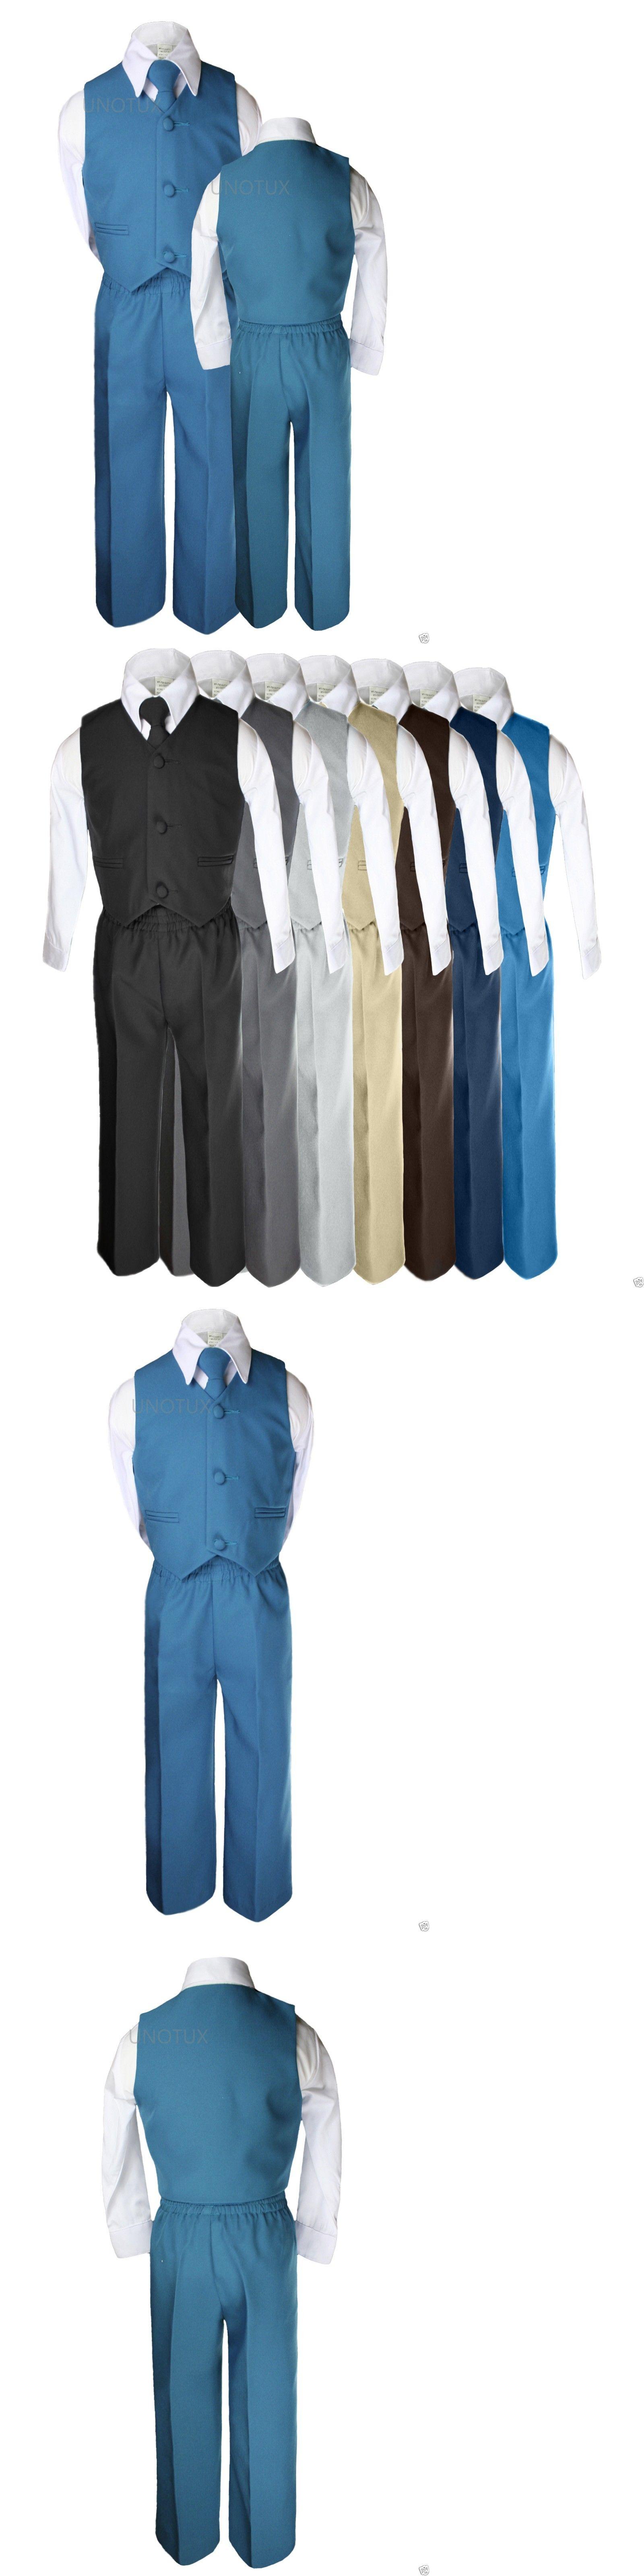 Suits 147337: Baby Boys Kids Wedding Formal Party Vest Set Blue ...